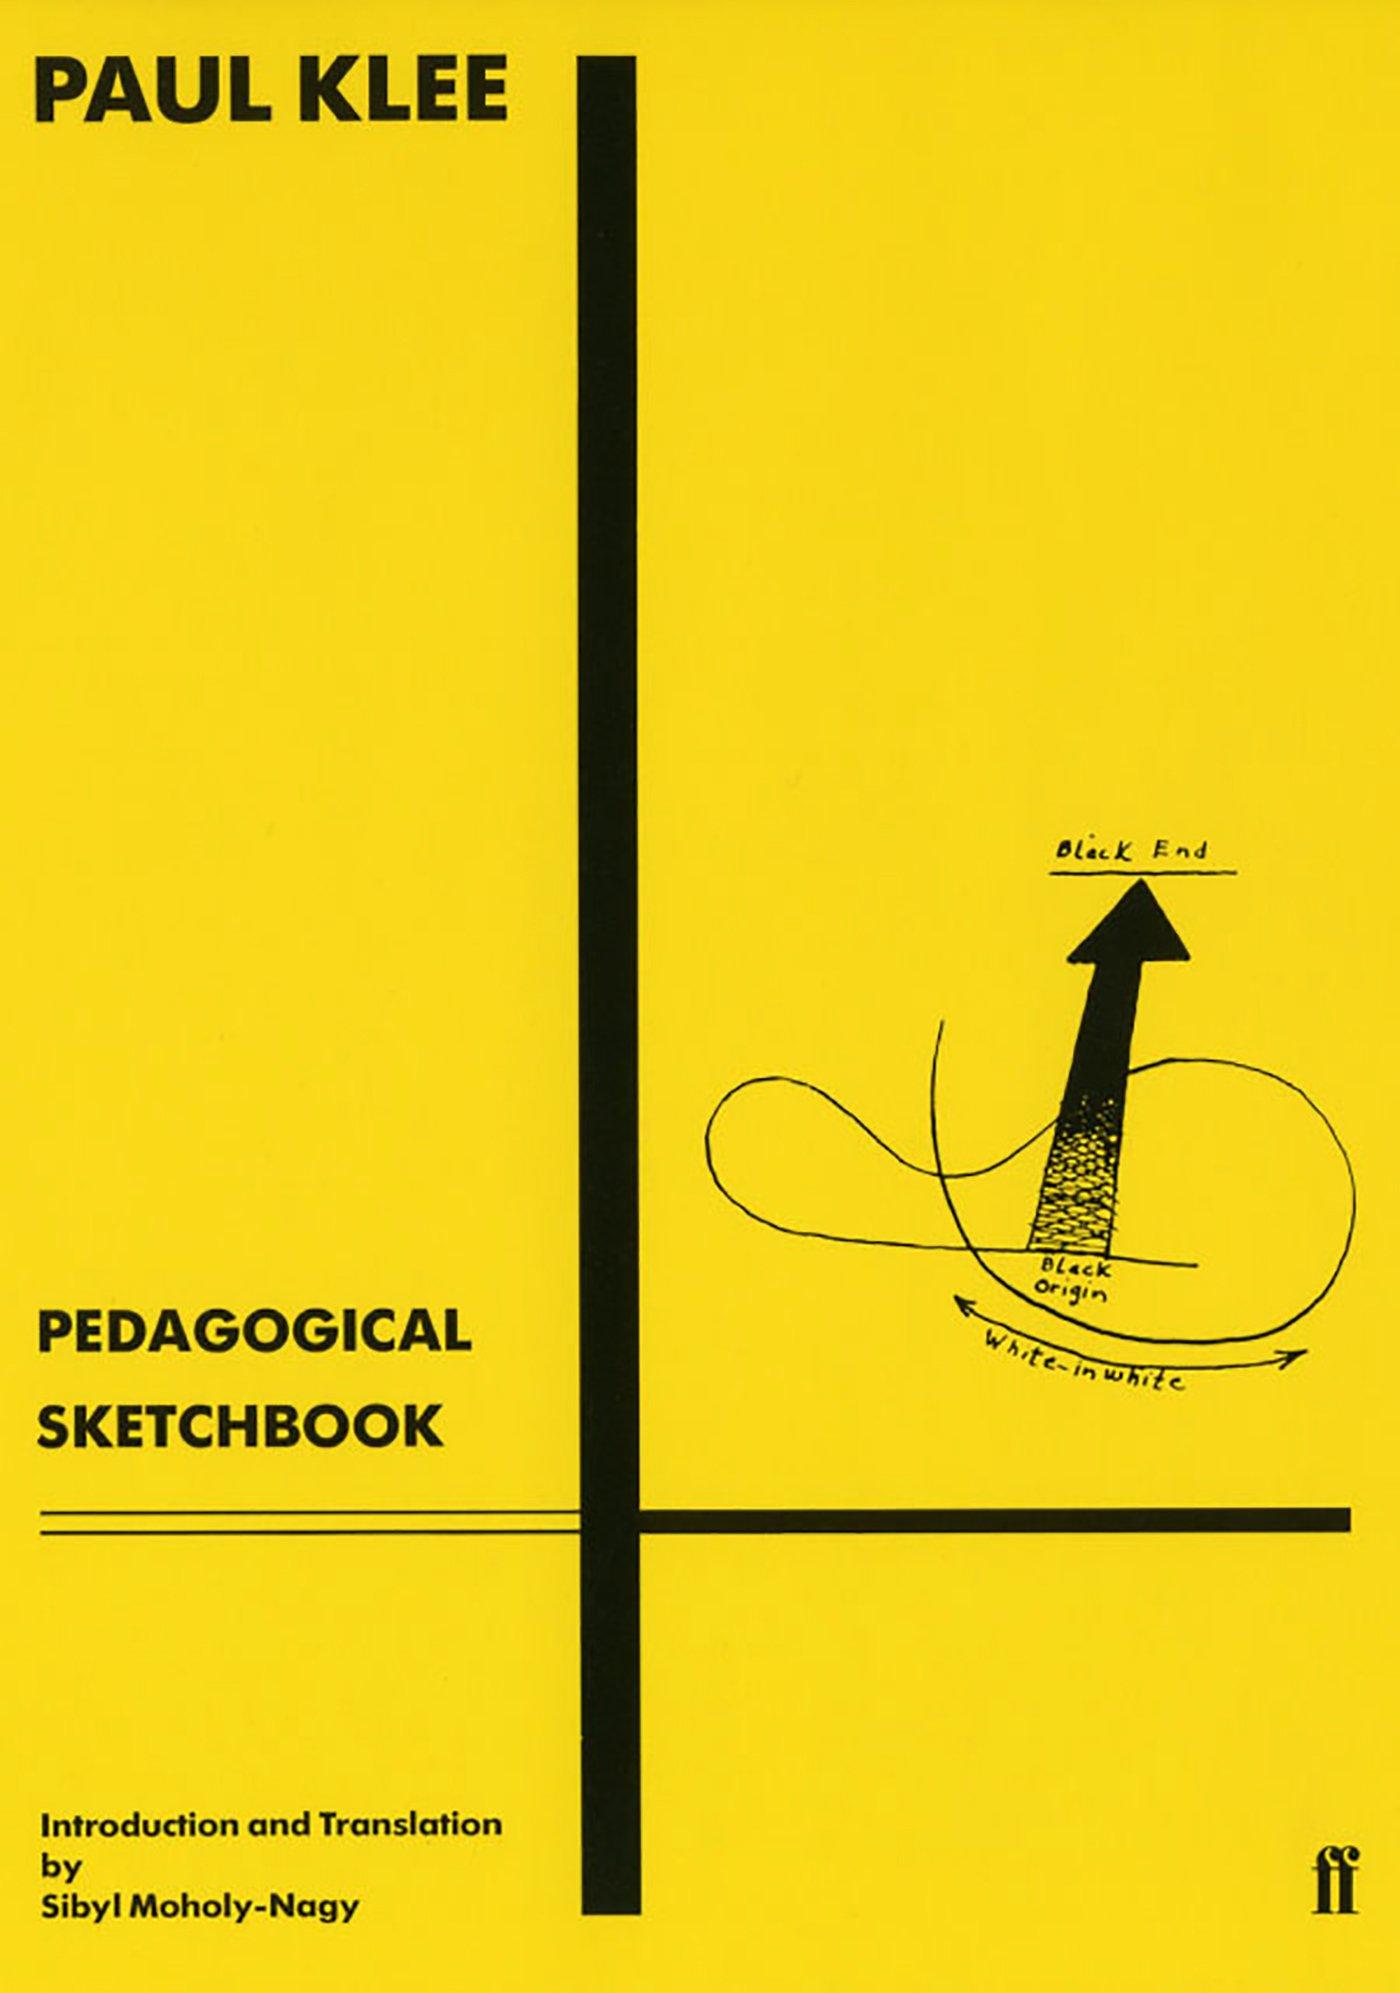 https://www.amazon.com/Pedagogical-Sketchbook-Paul-Klee/dp/0571086187